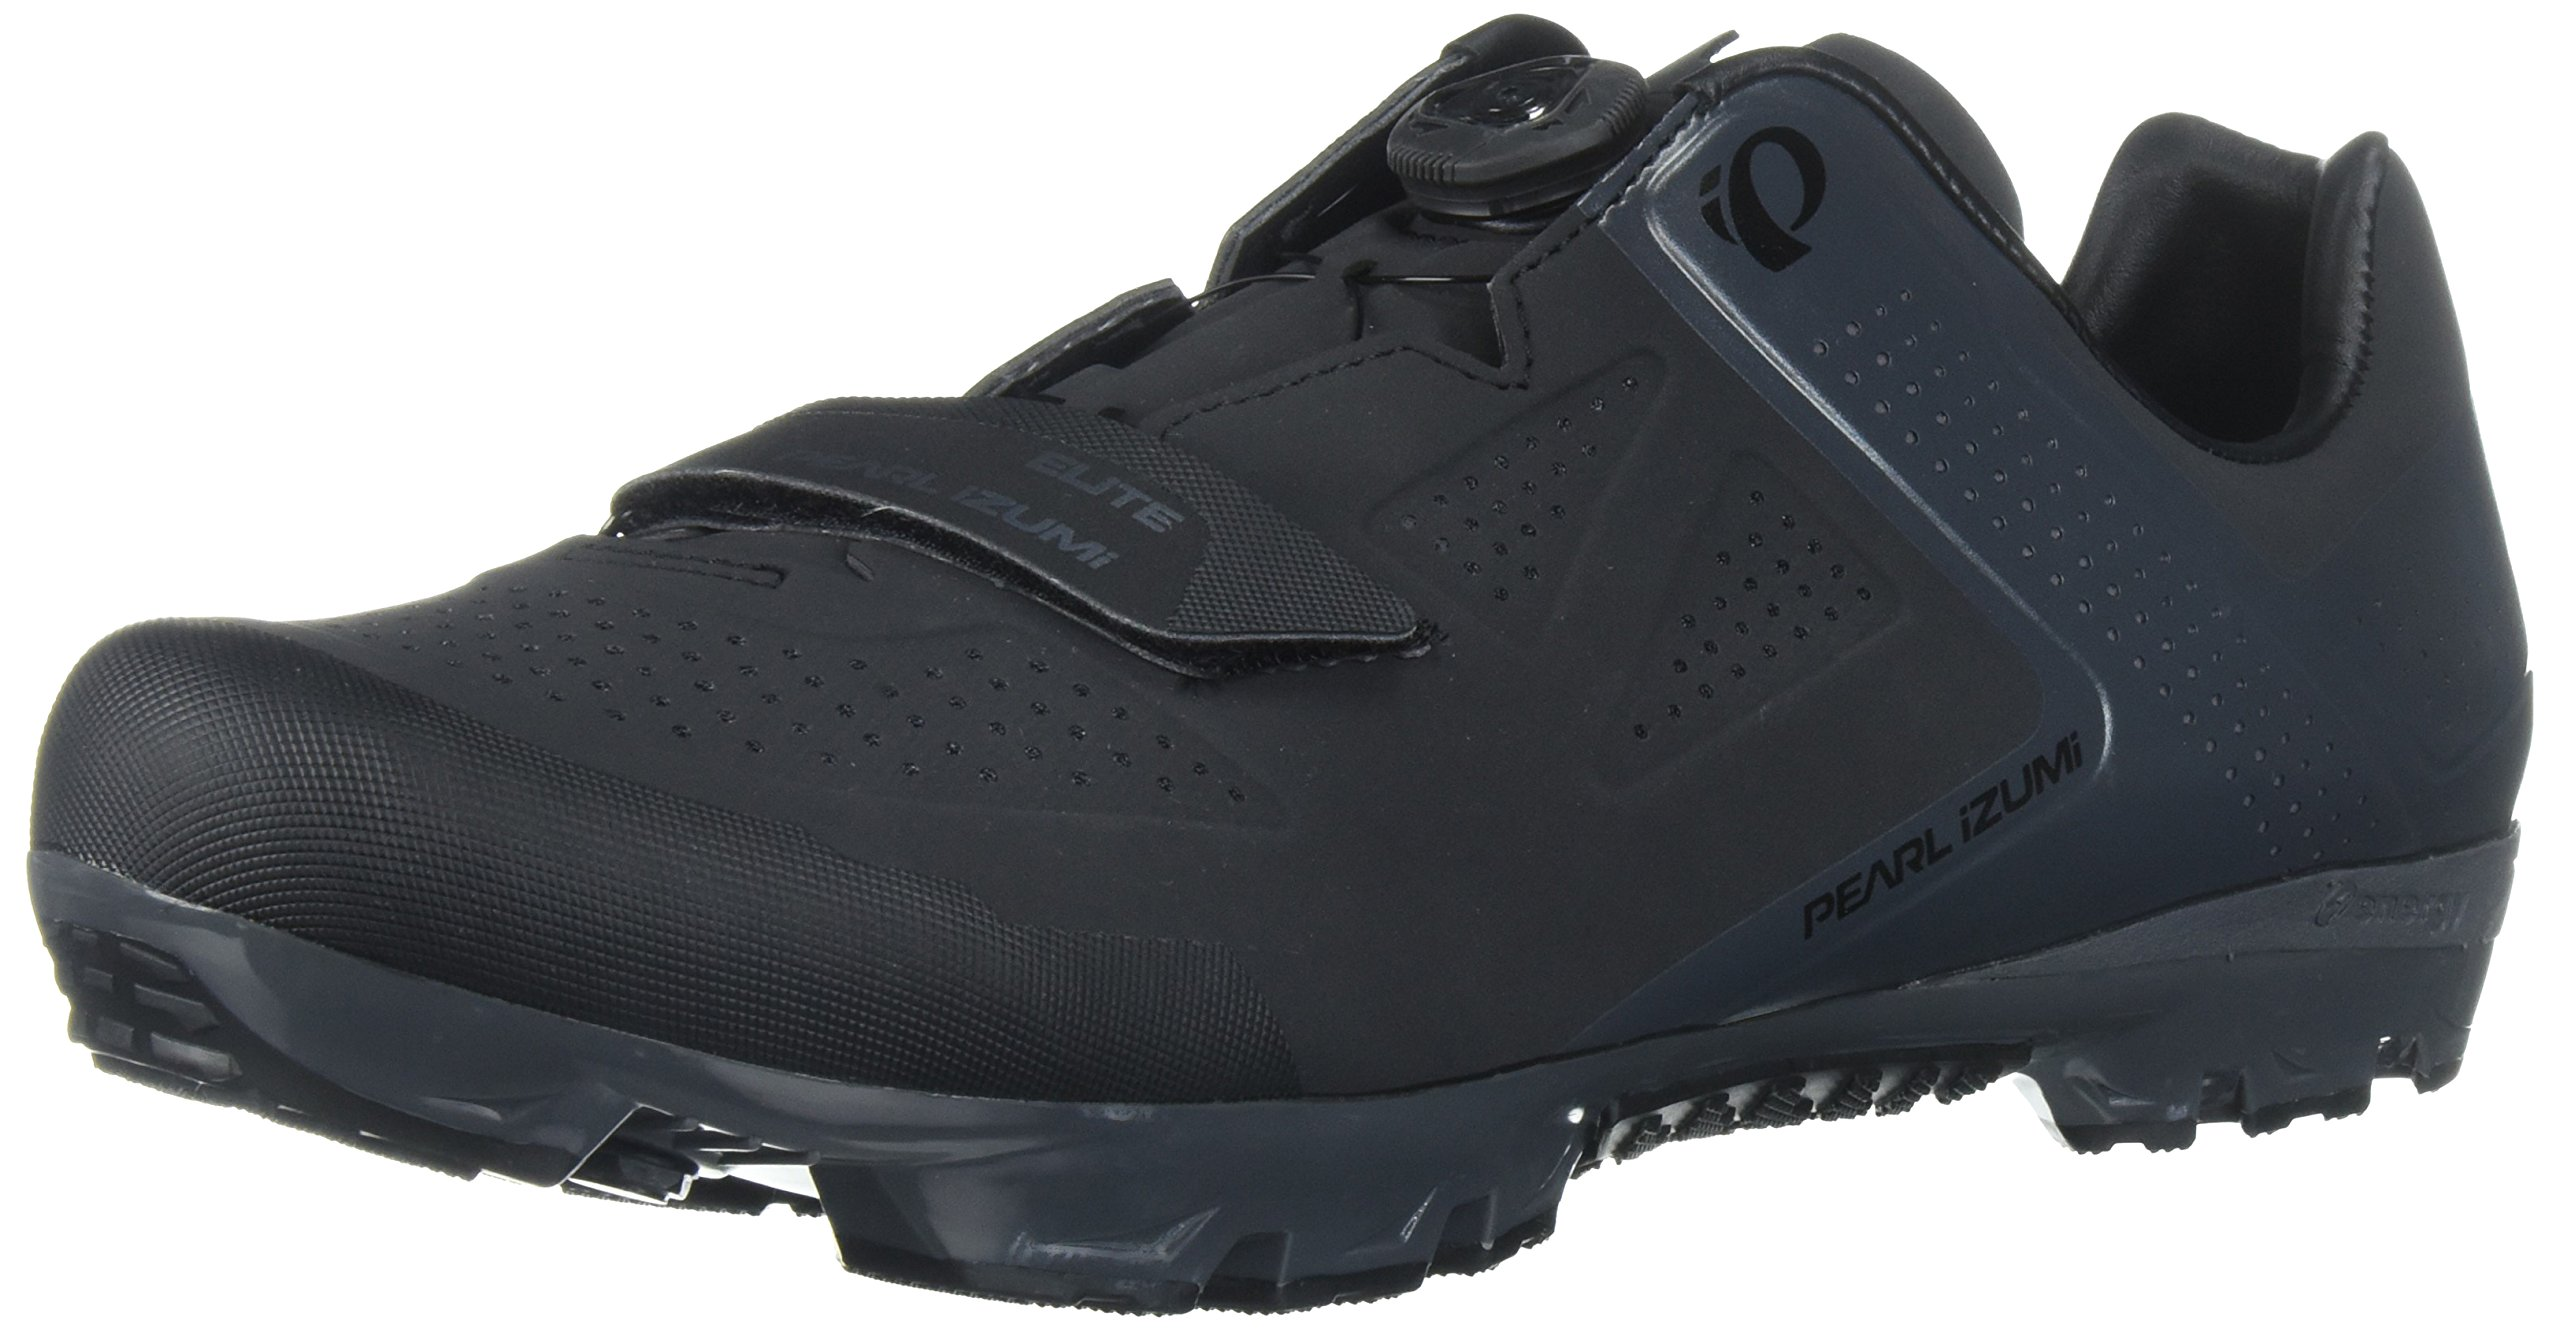 Pearl iZUMi Men's X-Project Elite Cycling-Footwear, Black/Shadow Grey, 49 EU/14 M US